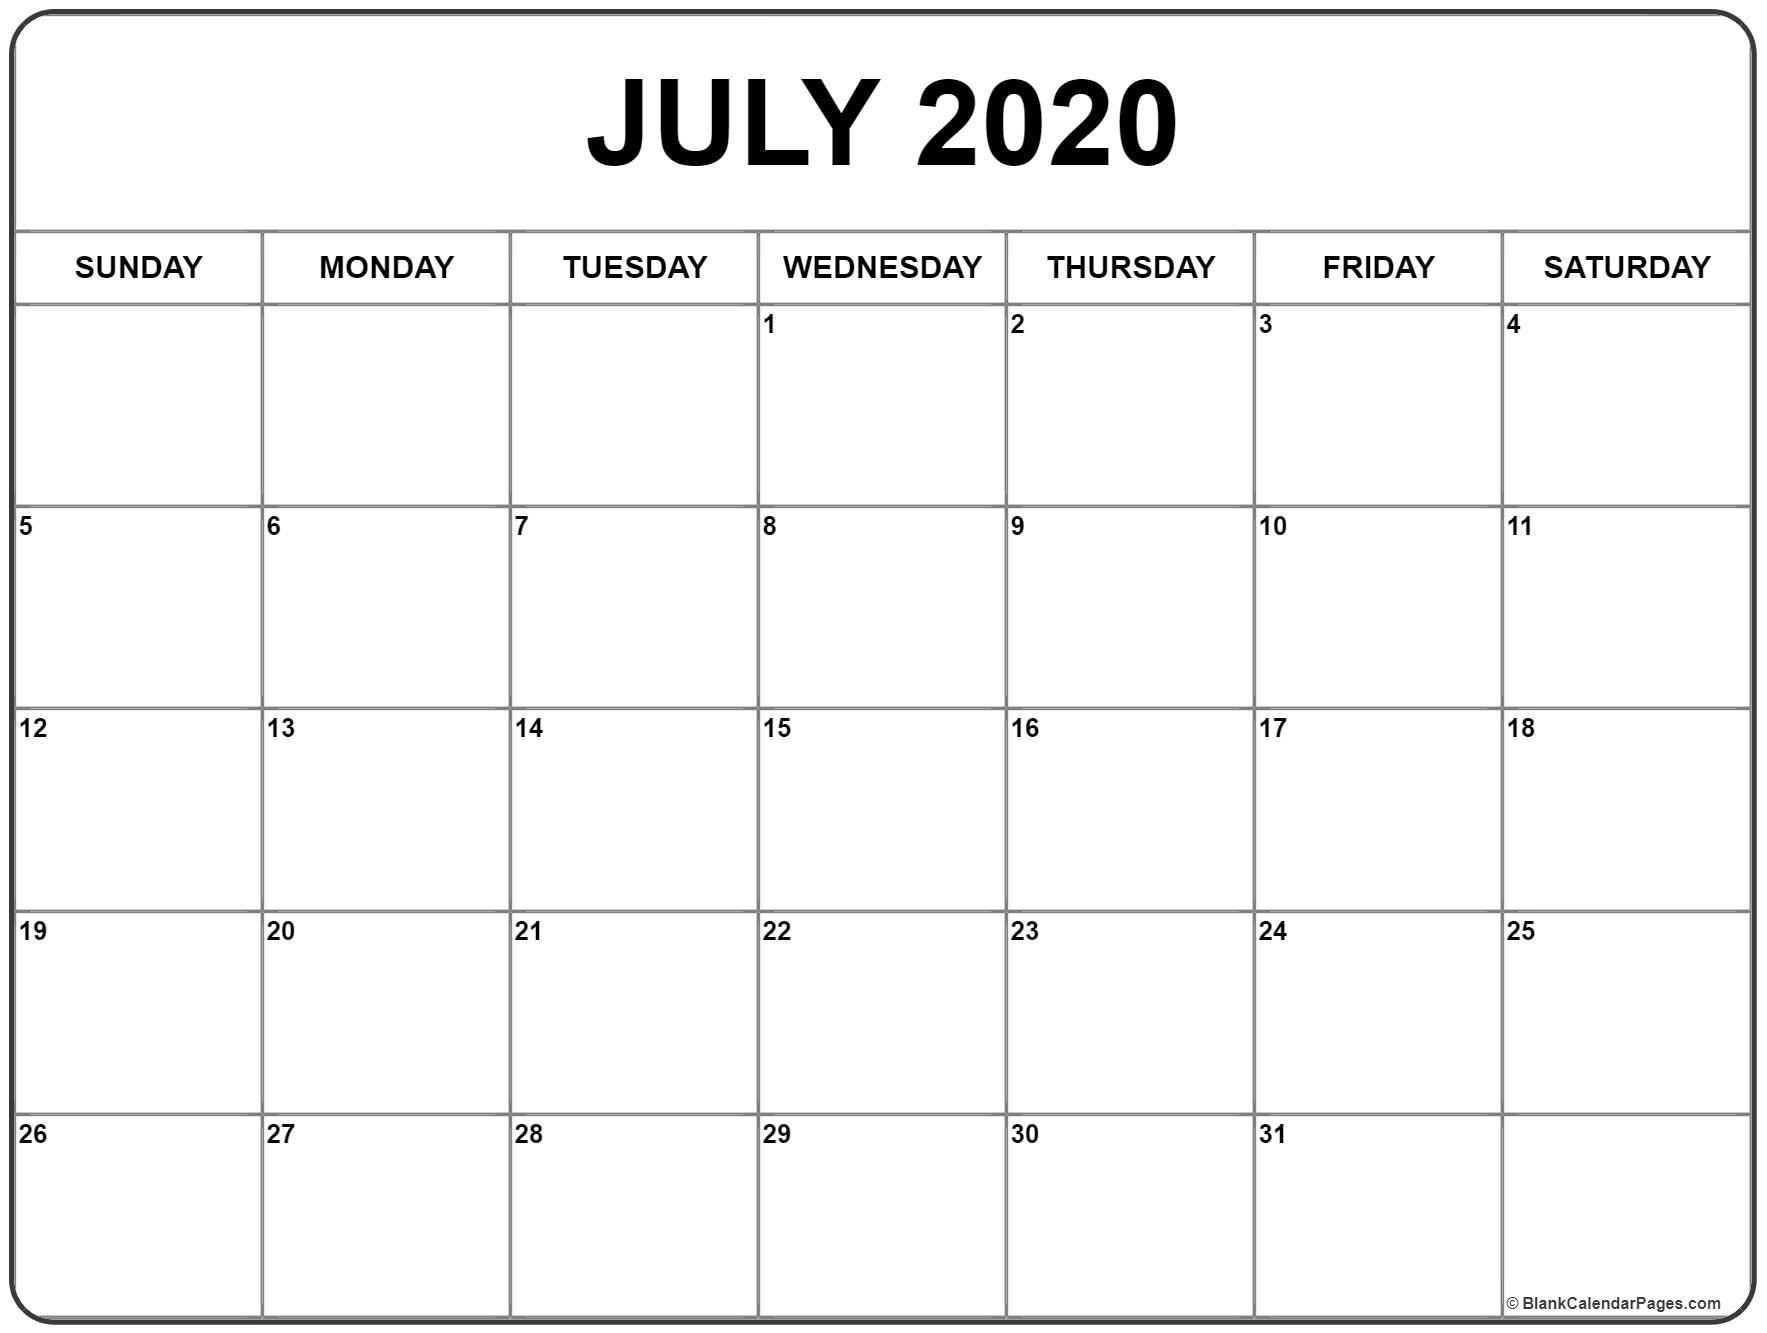 July 2020 Calendar | Printable Calendars | Printable Blank-Printable Monthly Calendar July August 2020